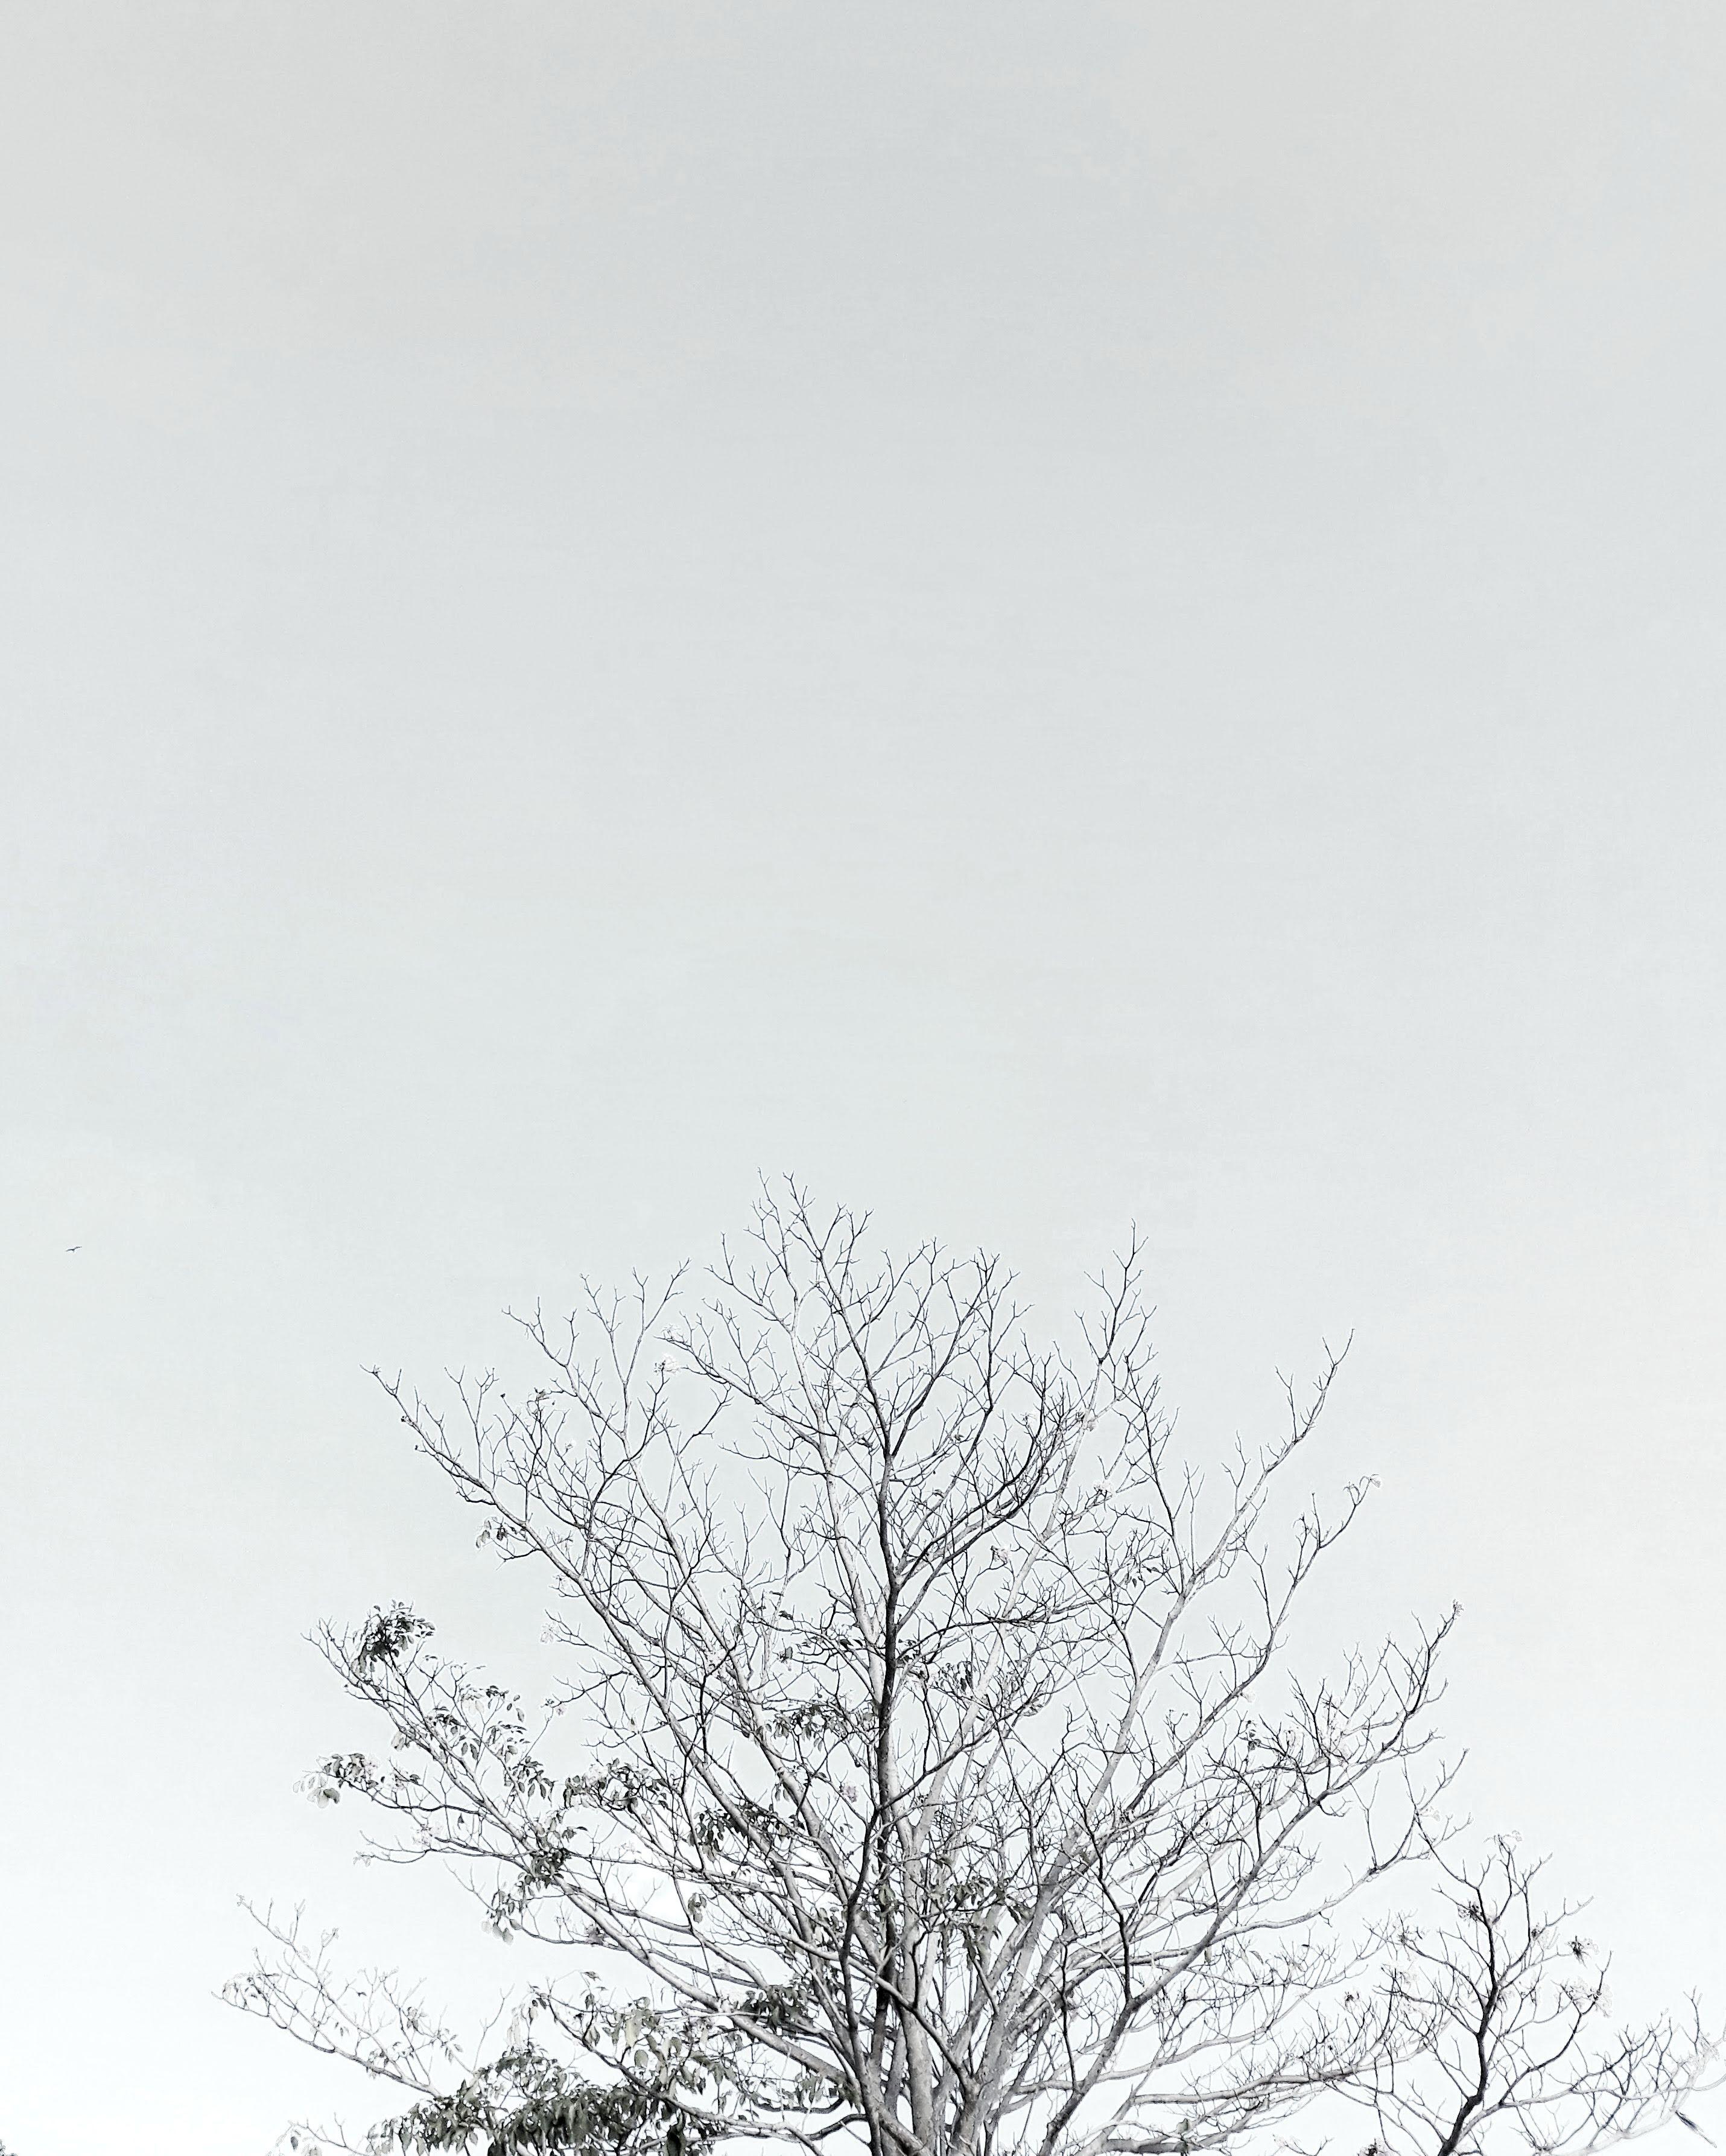 Background Hitam Putih Hd : background, hitam, putih, Stock, Photo, Black, Background,, White,, Minimal